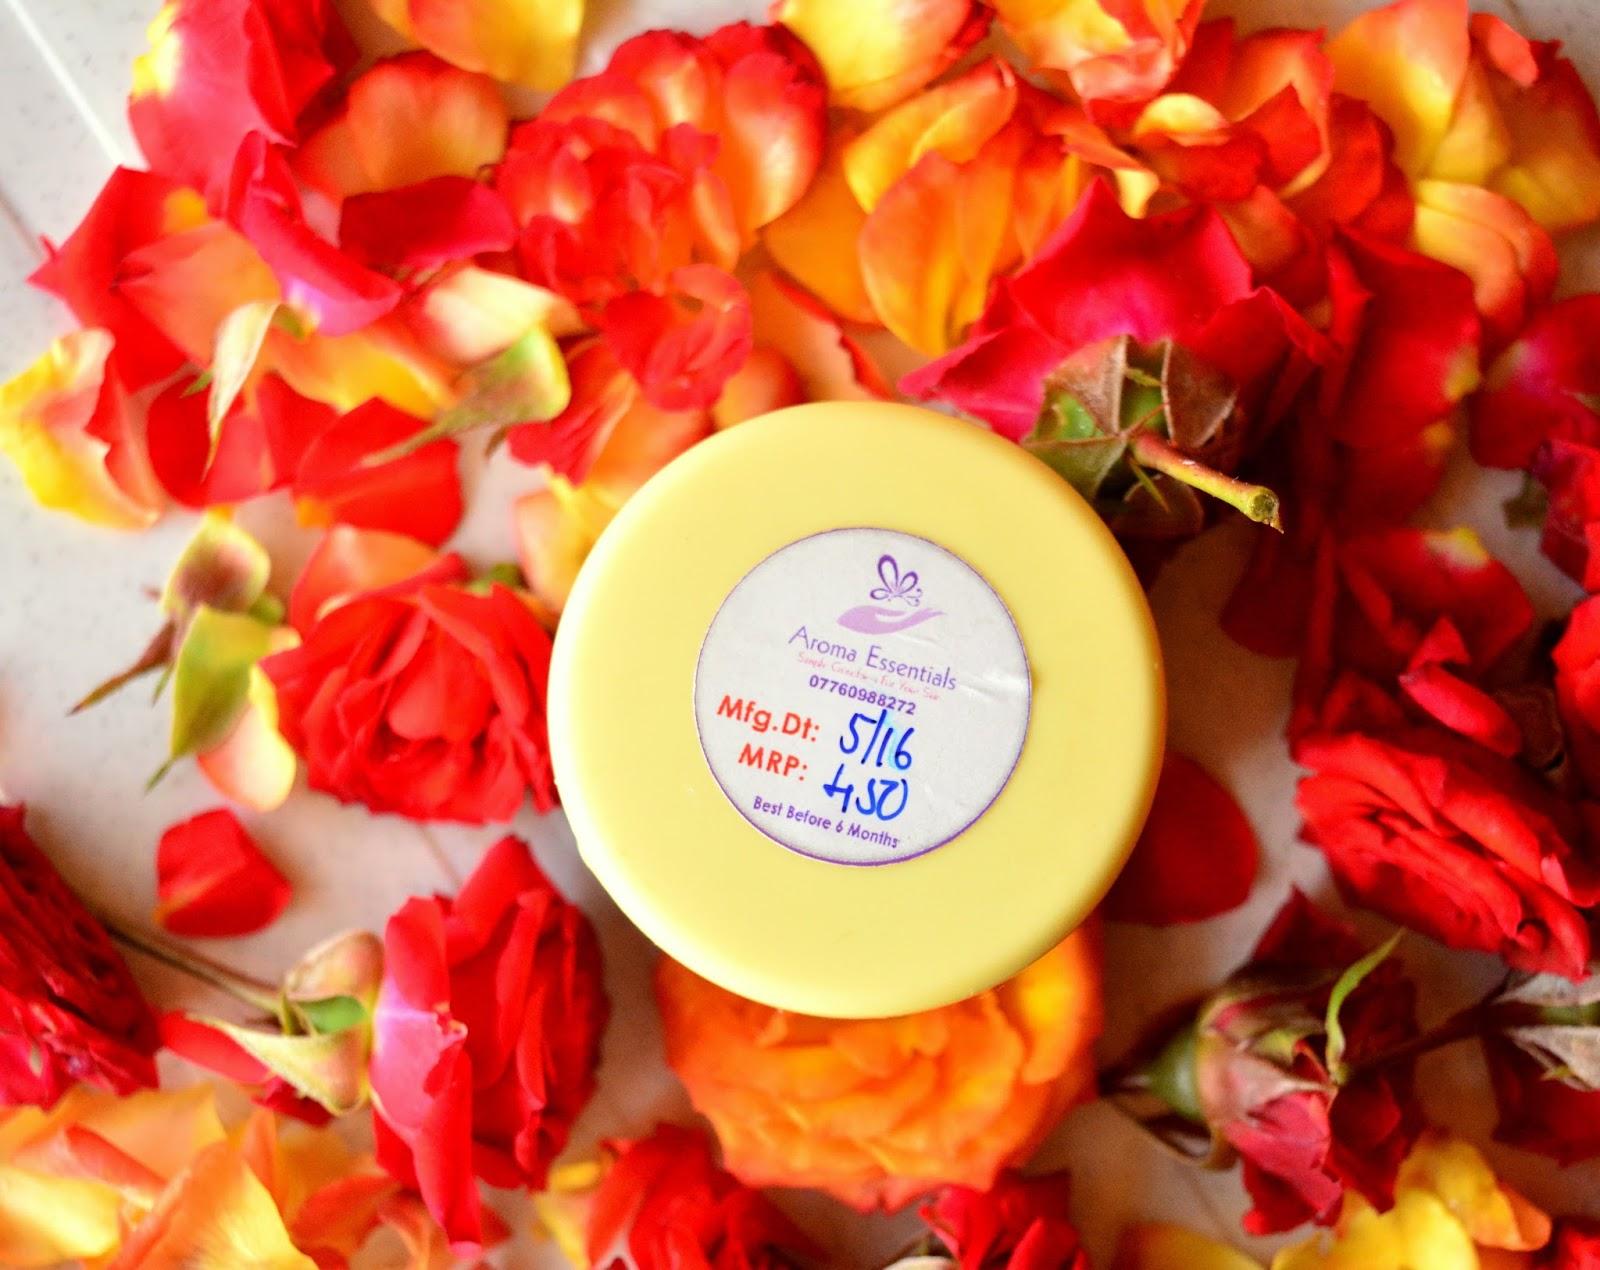 Review | Aroma Essentials Face Masks